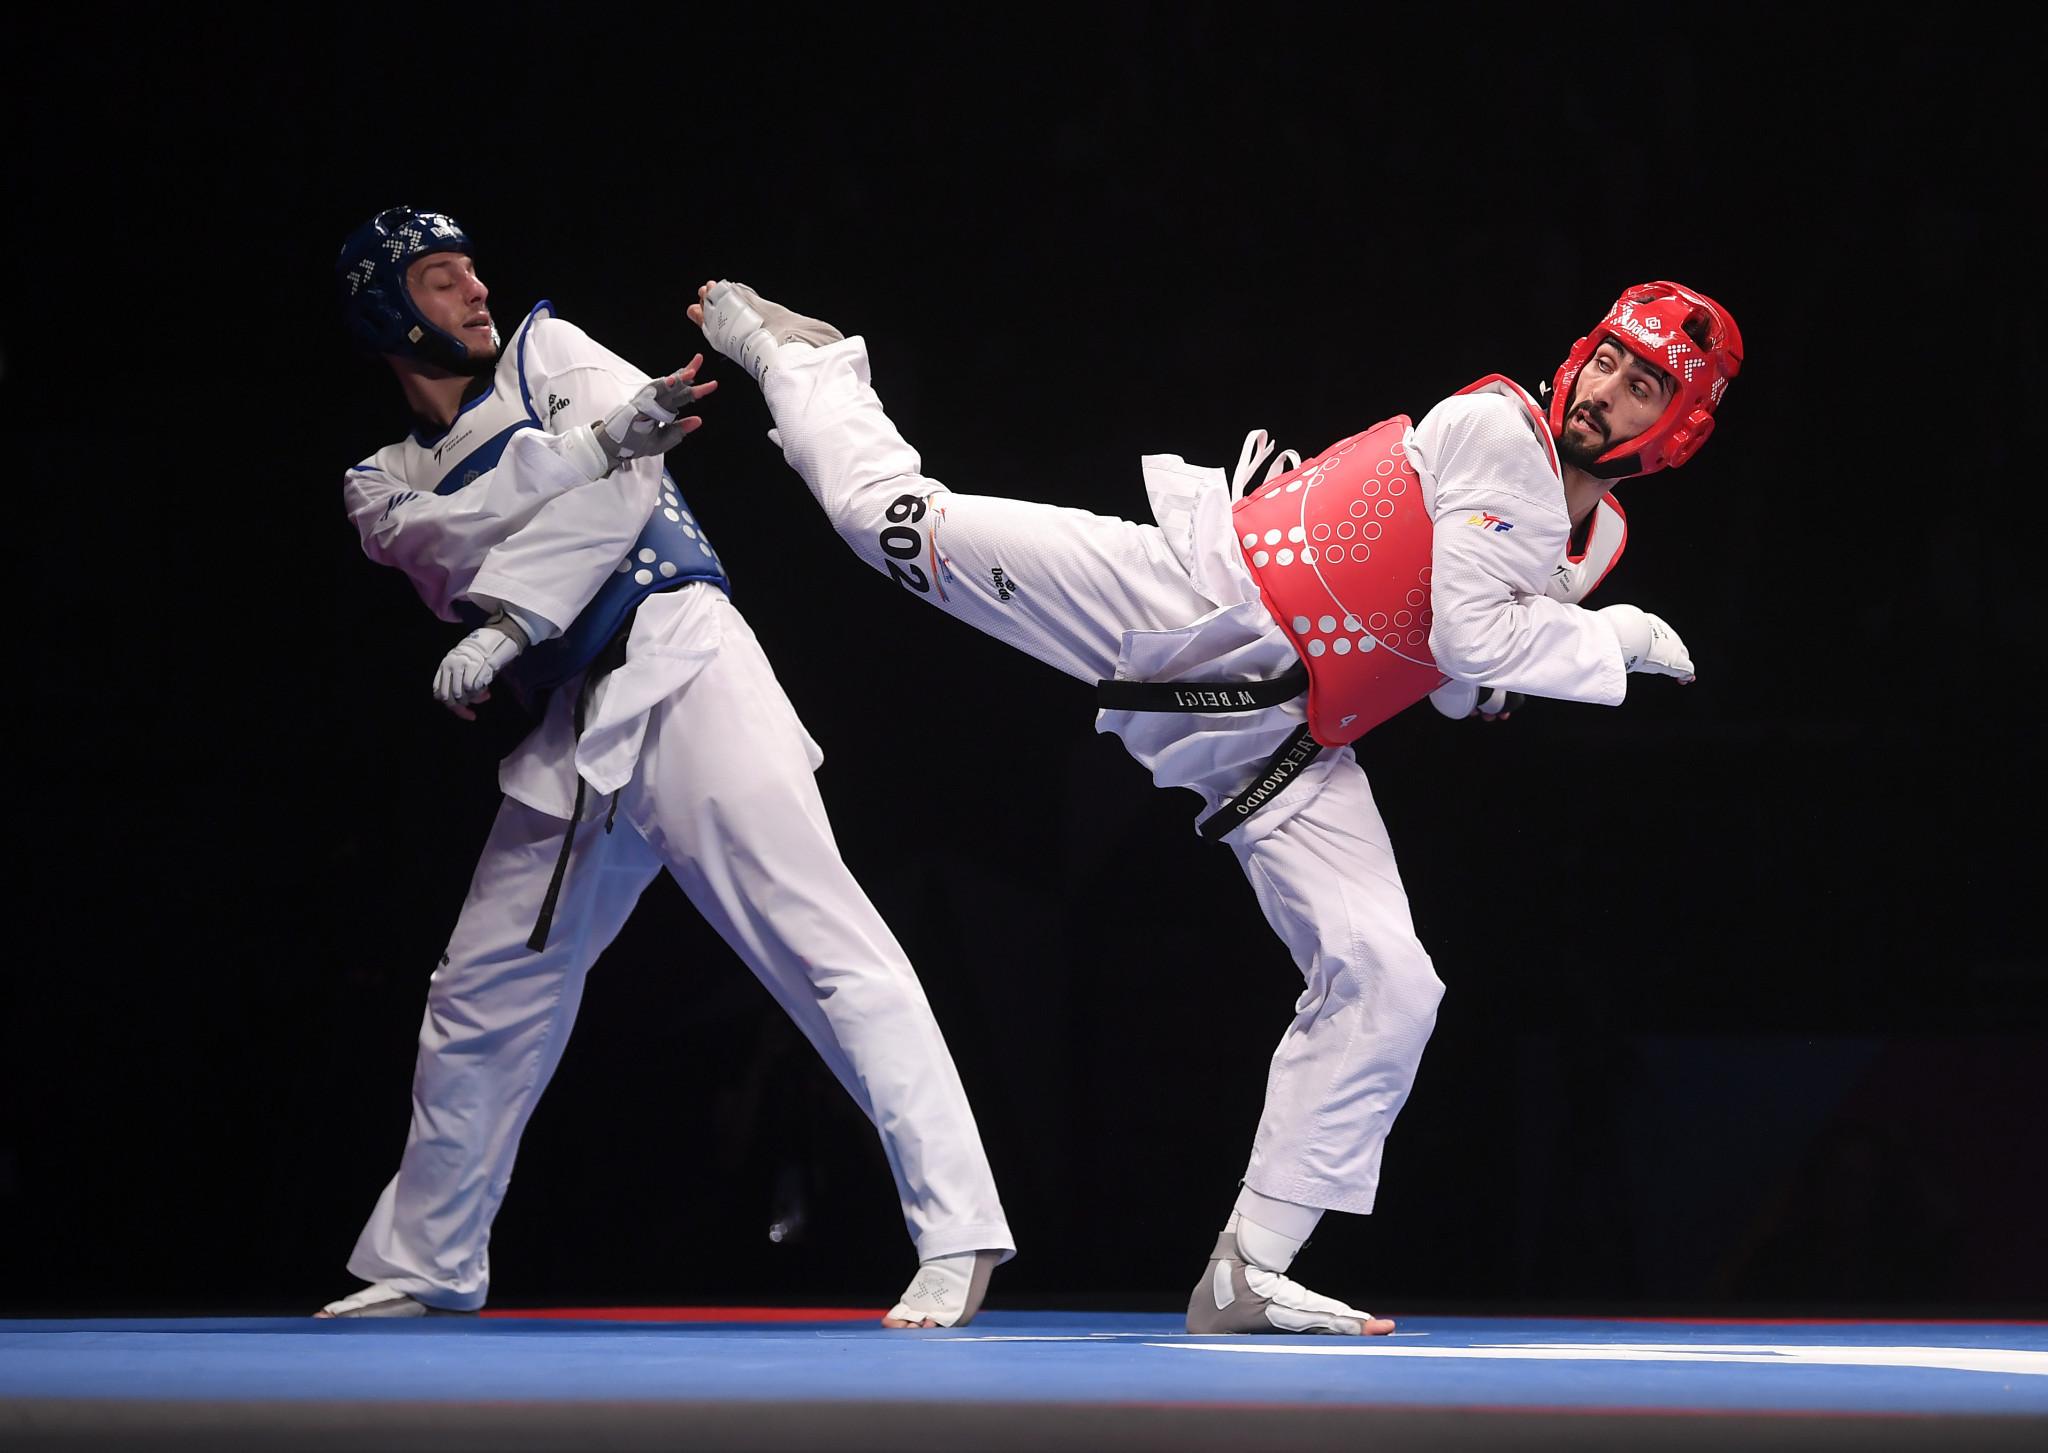 Azerbaijan's Milad Beigi Harchegani successfully defended his men's under-80kg title ©Getty Images